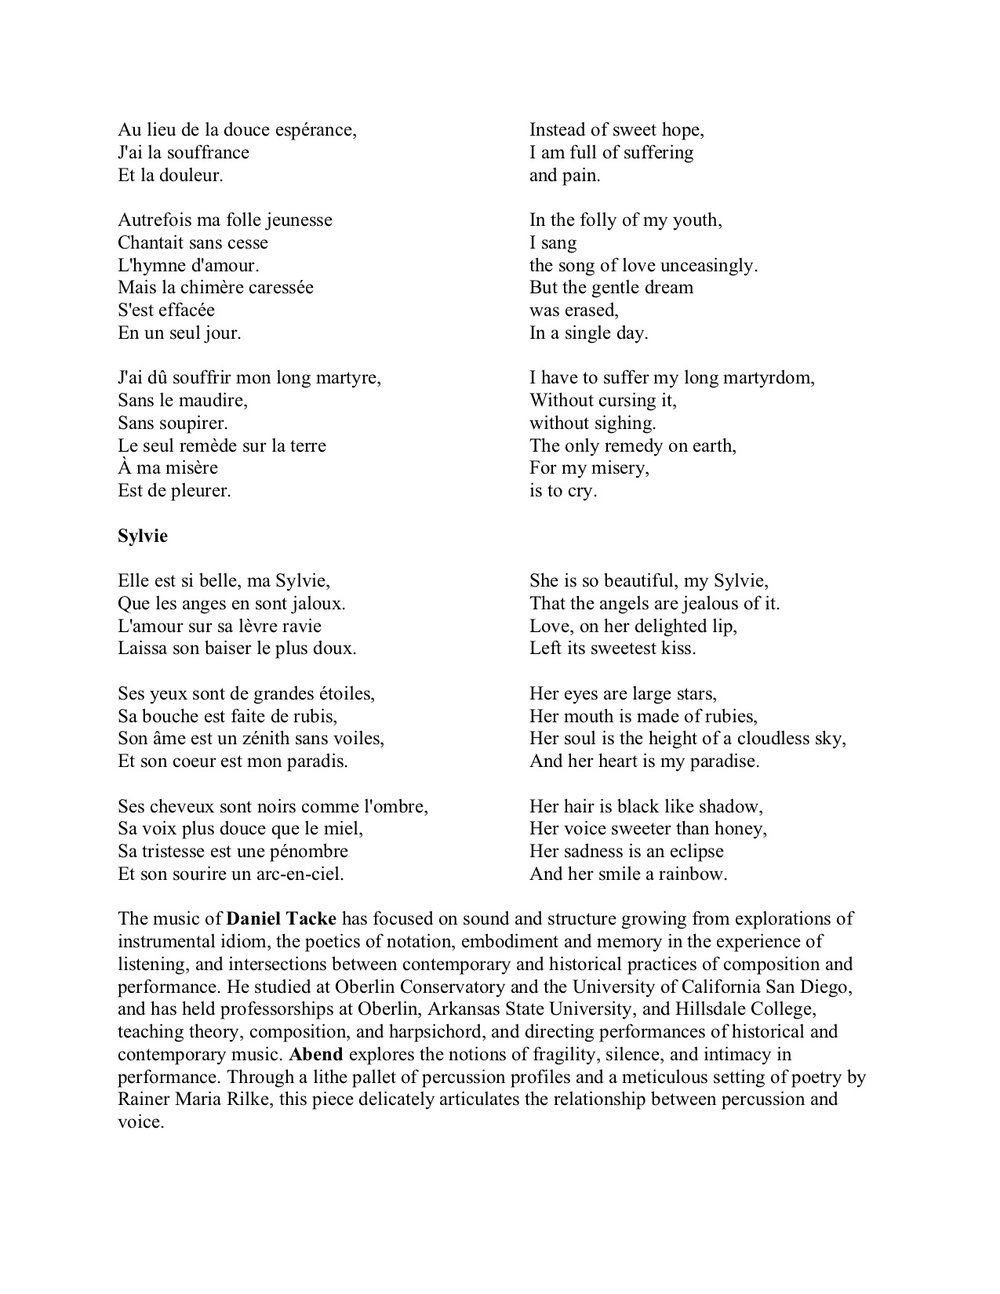 Graduate Recital Program Notes pg 2.jpg